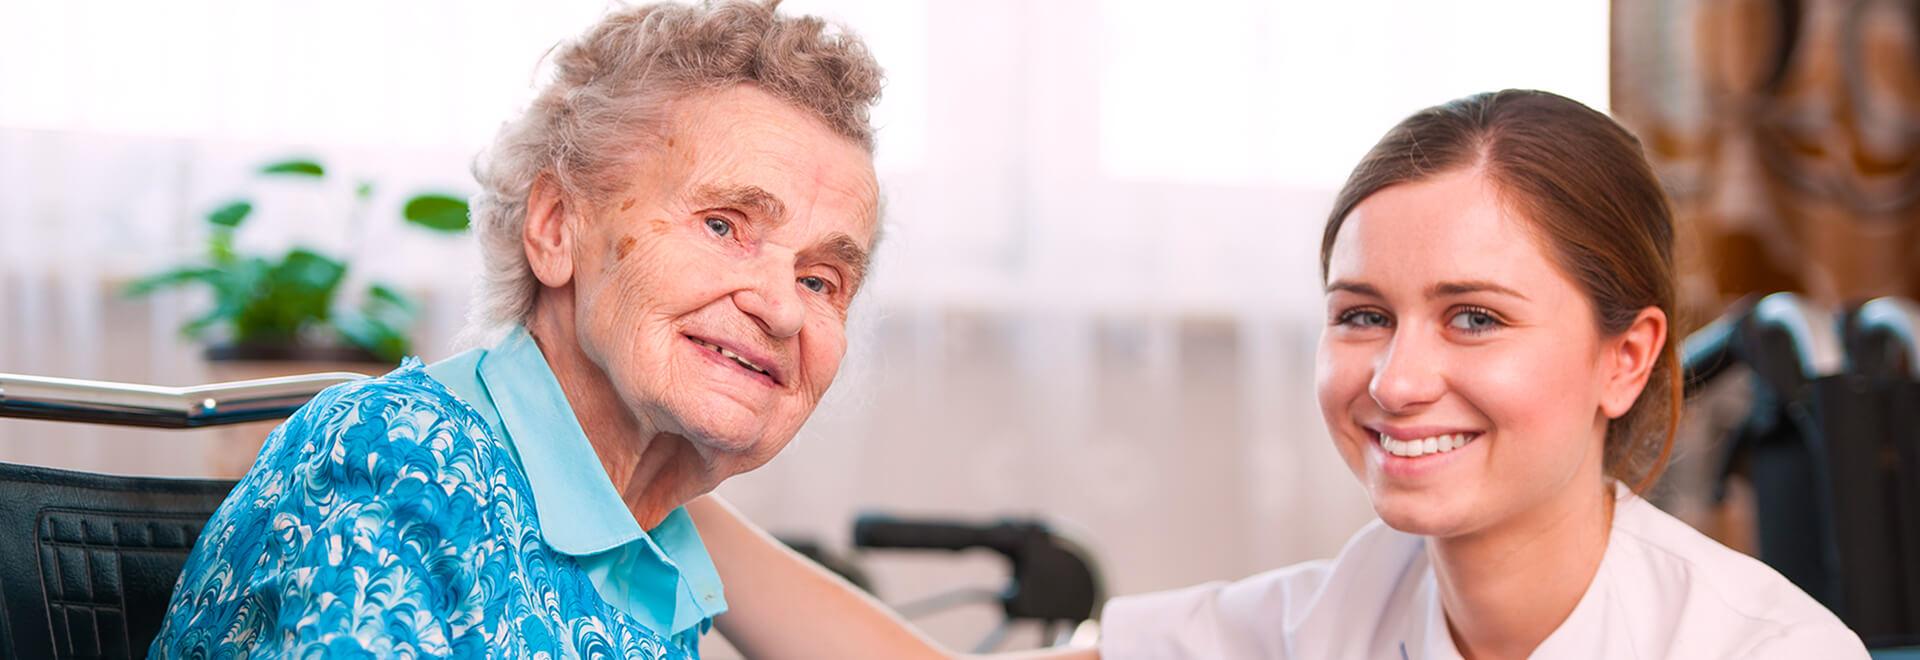 Domus-Cura-Arbeitgeber-Jobs-Altenpflege